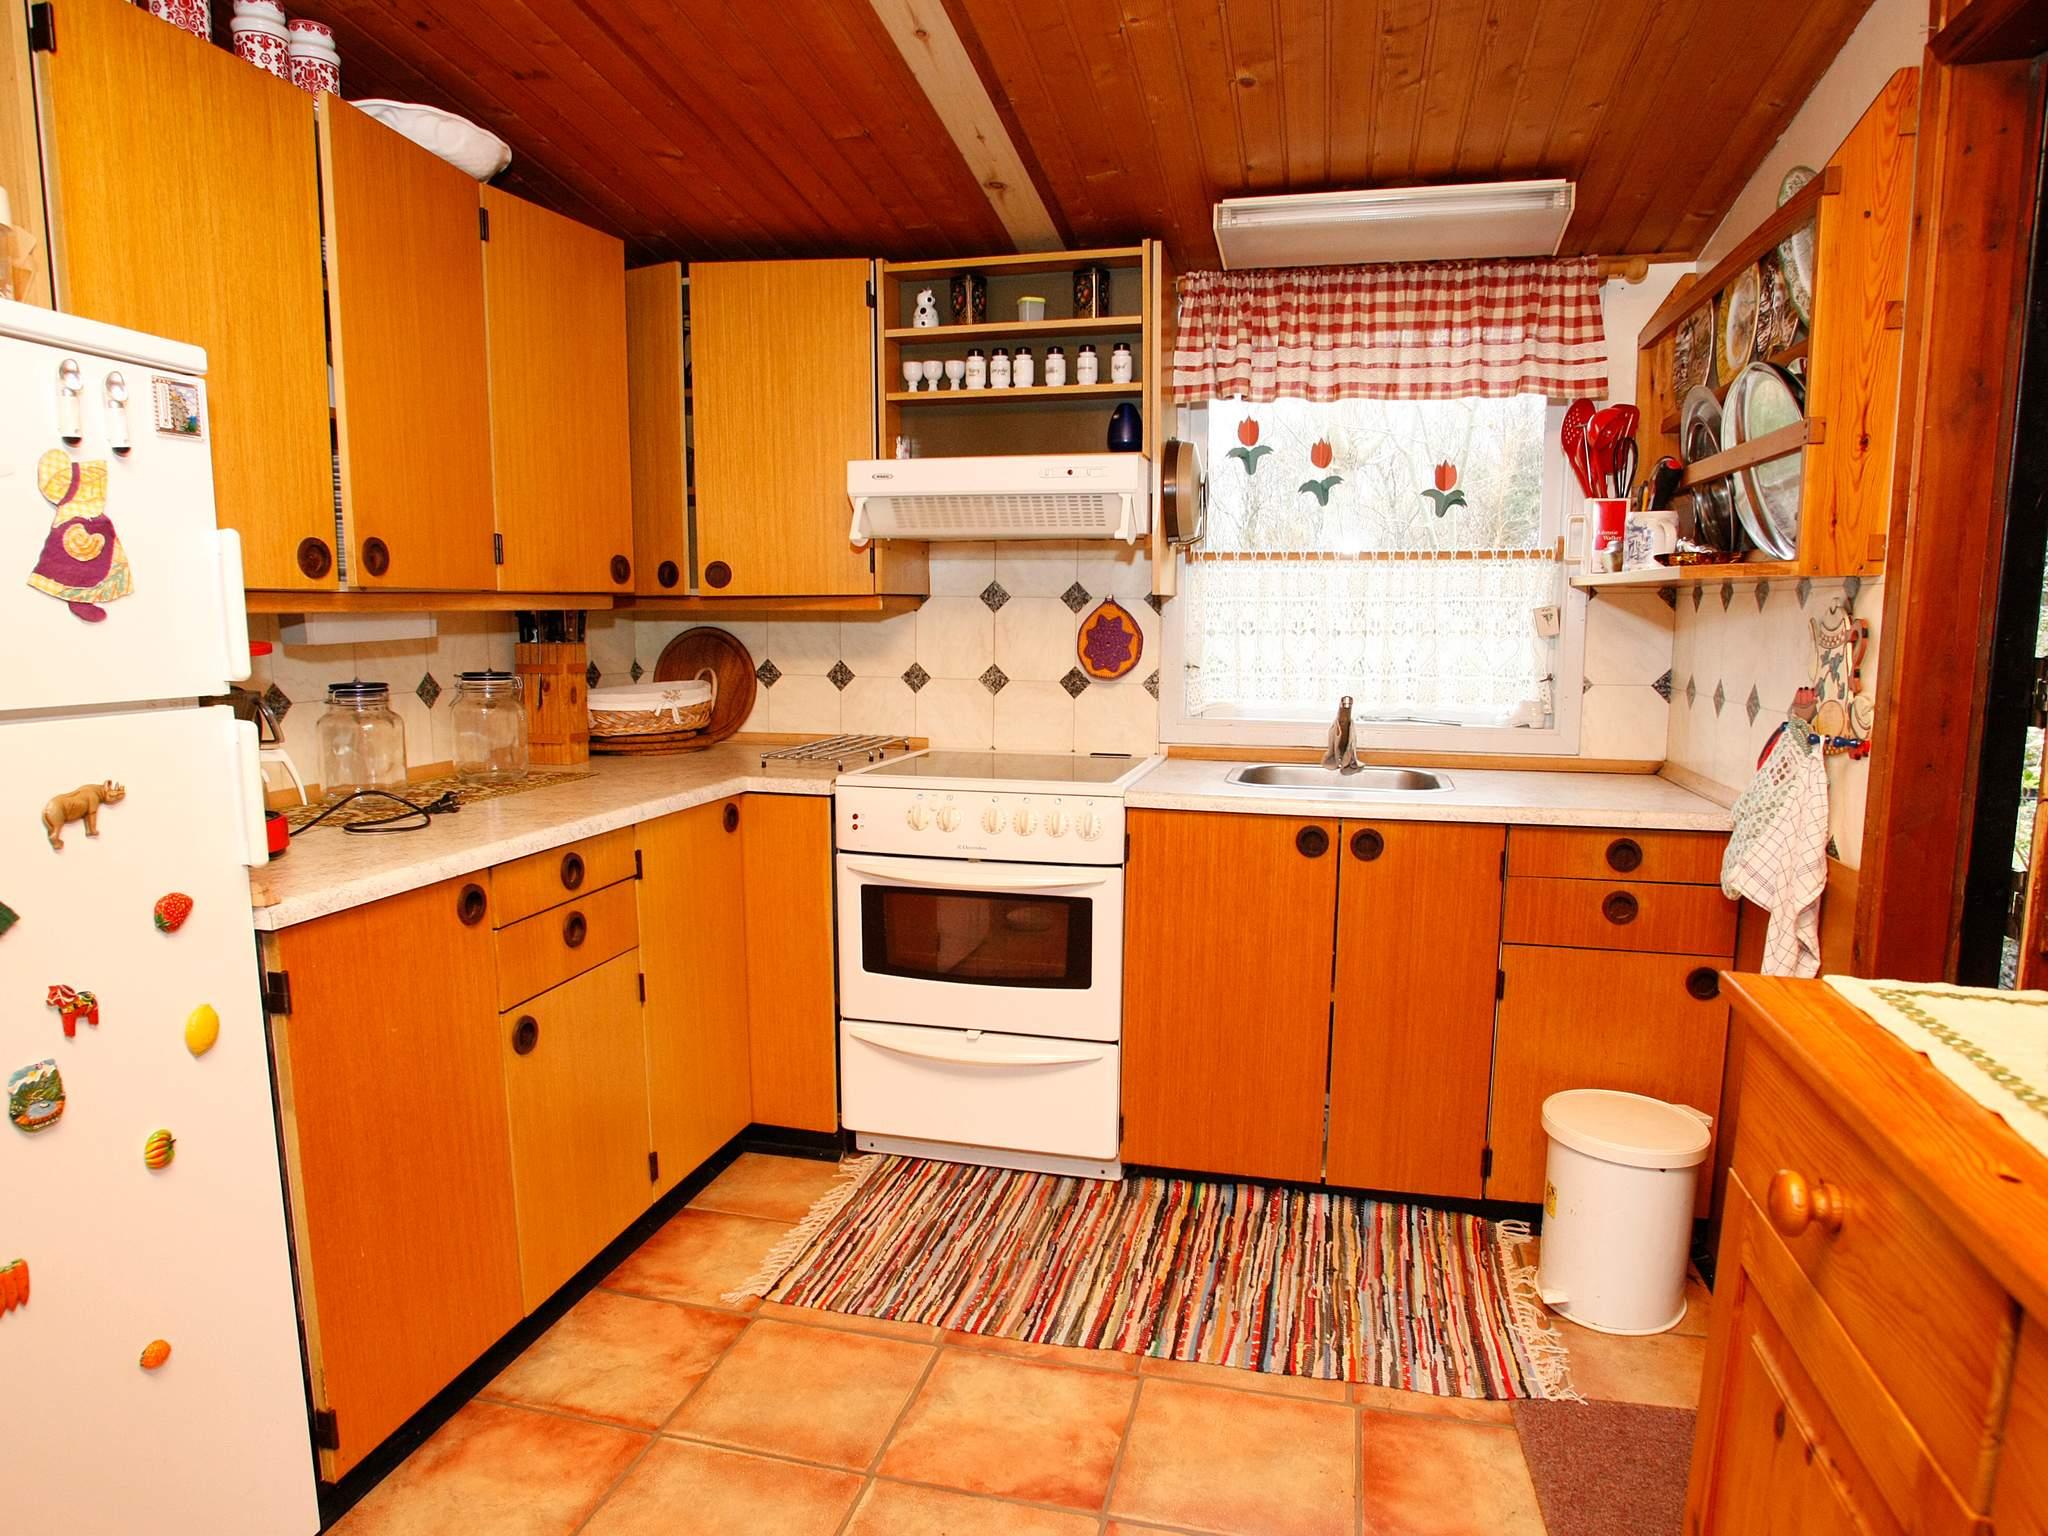 Ferienhaus Thyholm/Serup Strand (82880), Thyholm, Thyholm, Limfjord, Dänemark, Bild 8